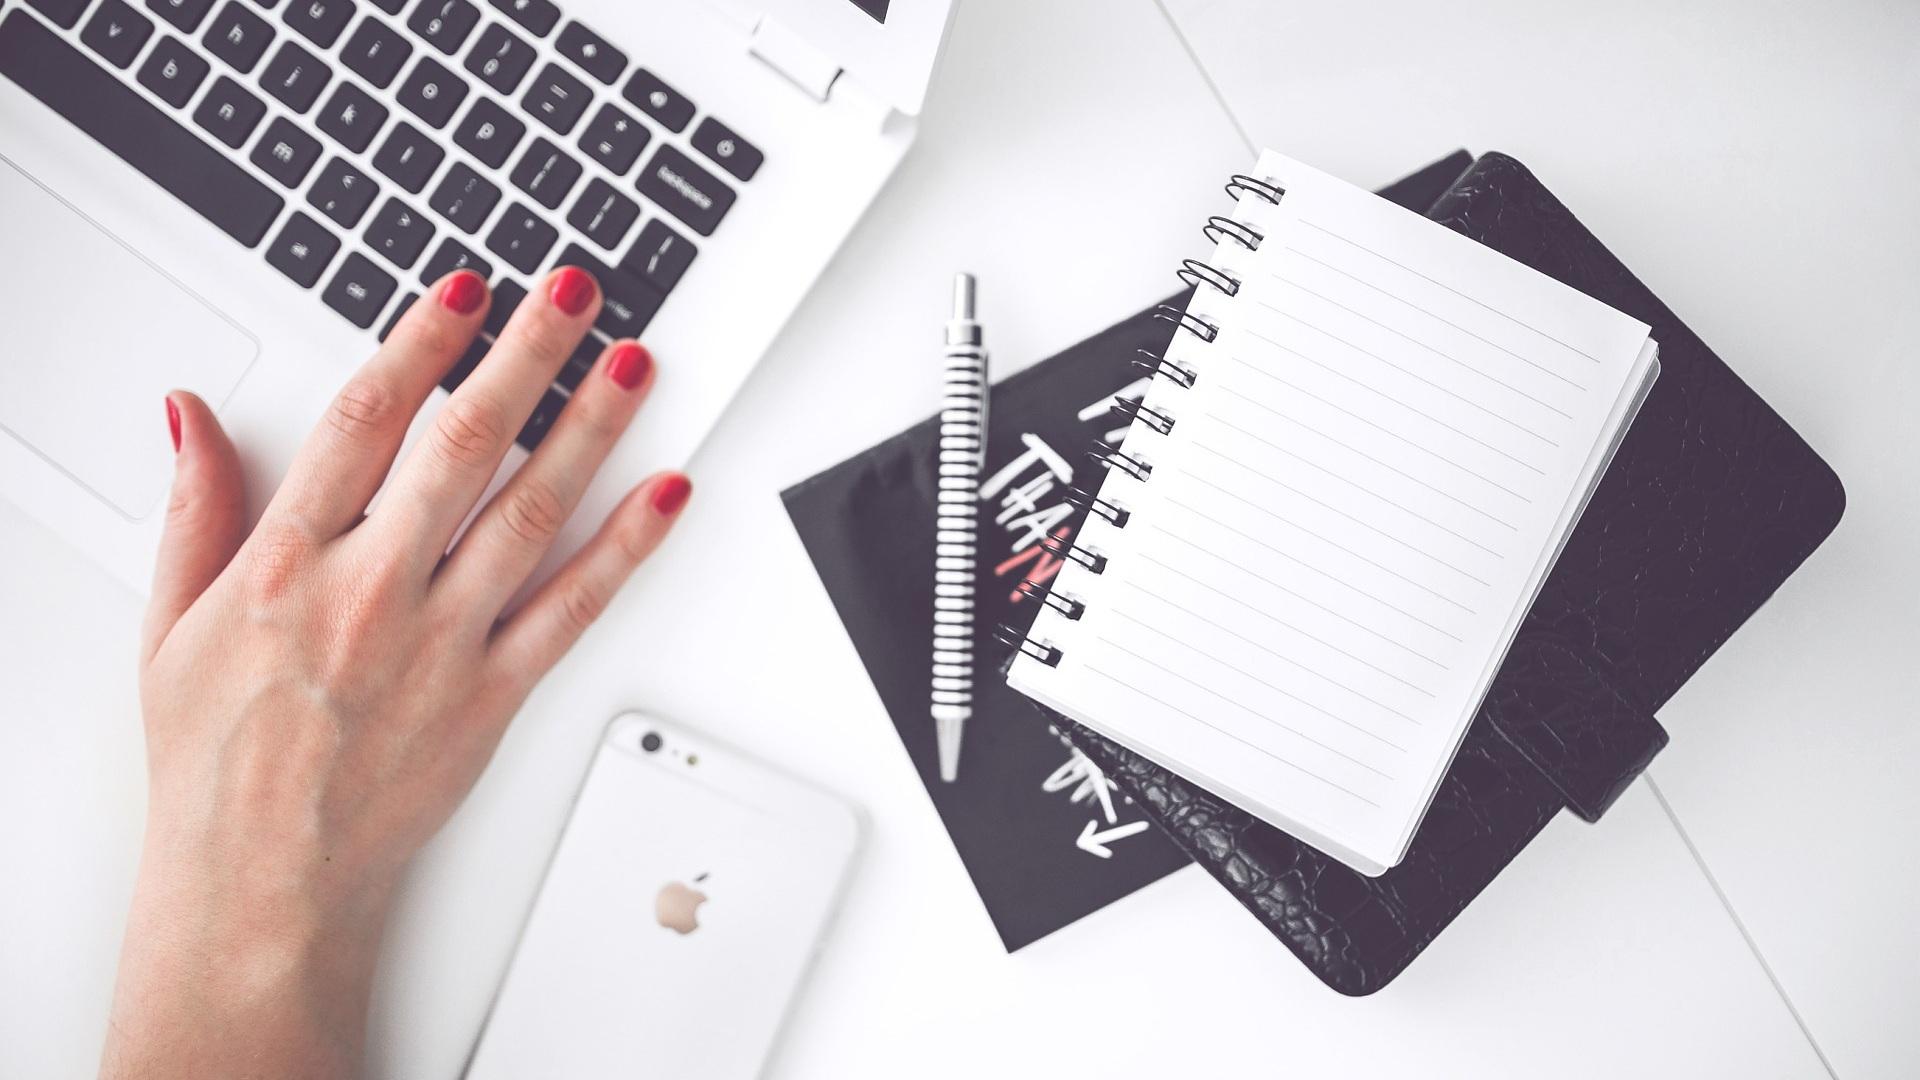 BRAND DEVELOPMENT - Graphic Design, Brand Collateral & Brand development.